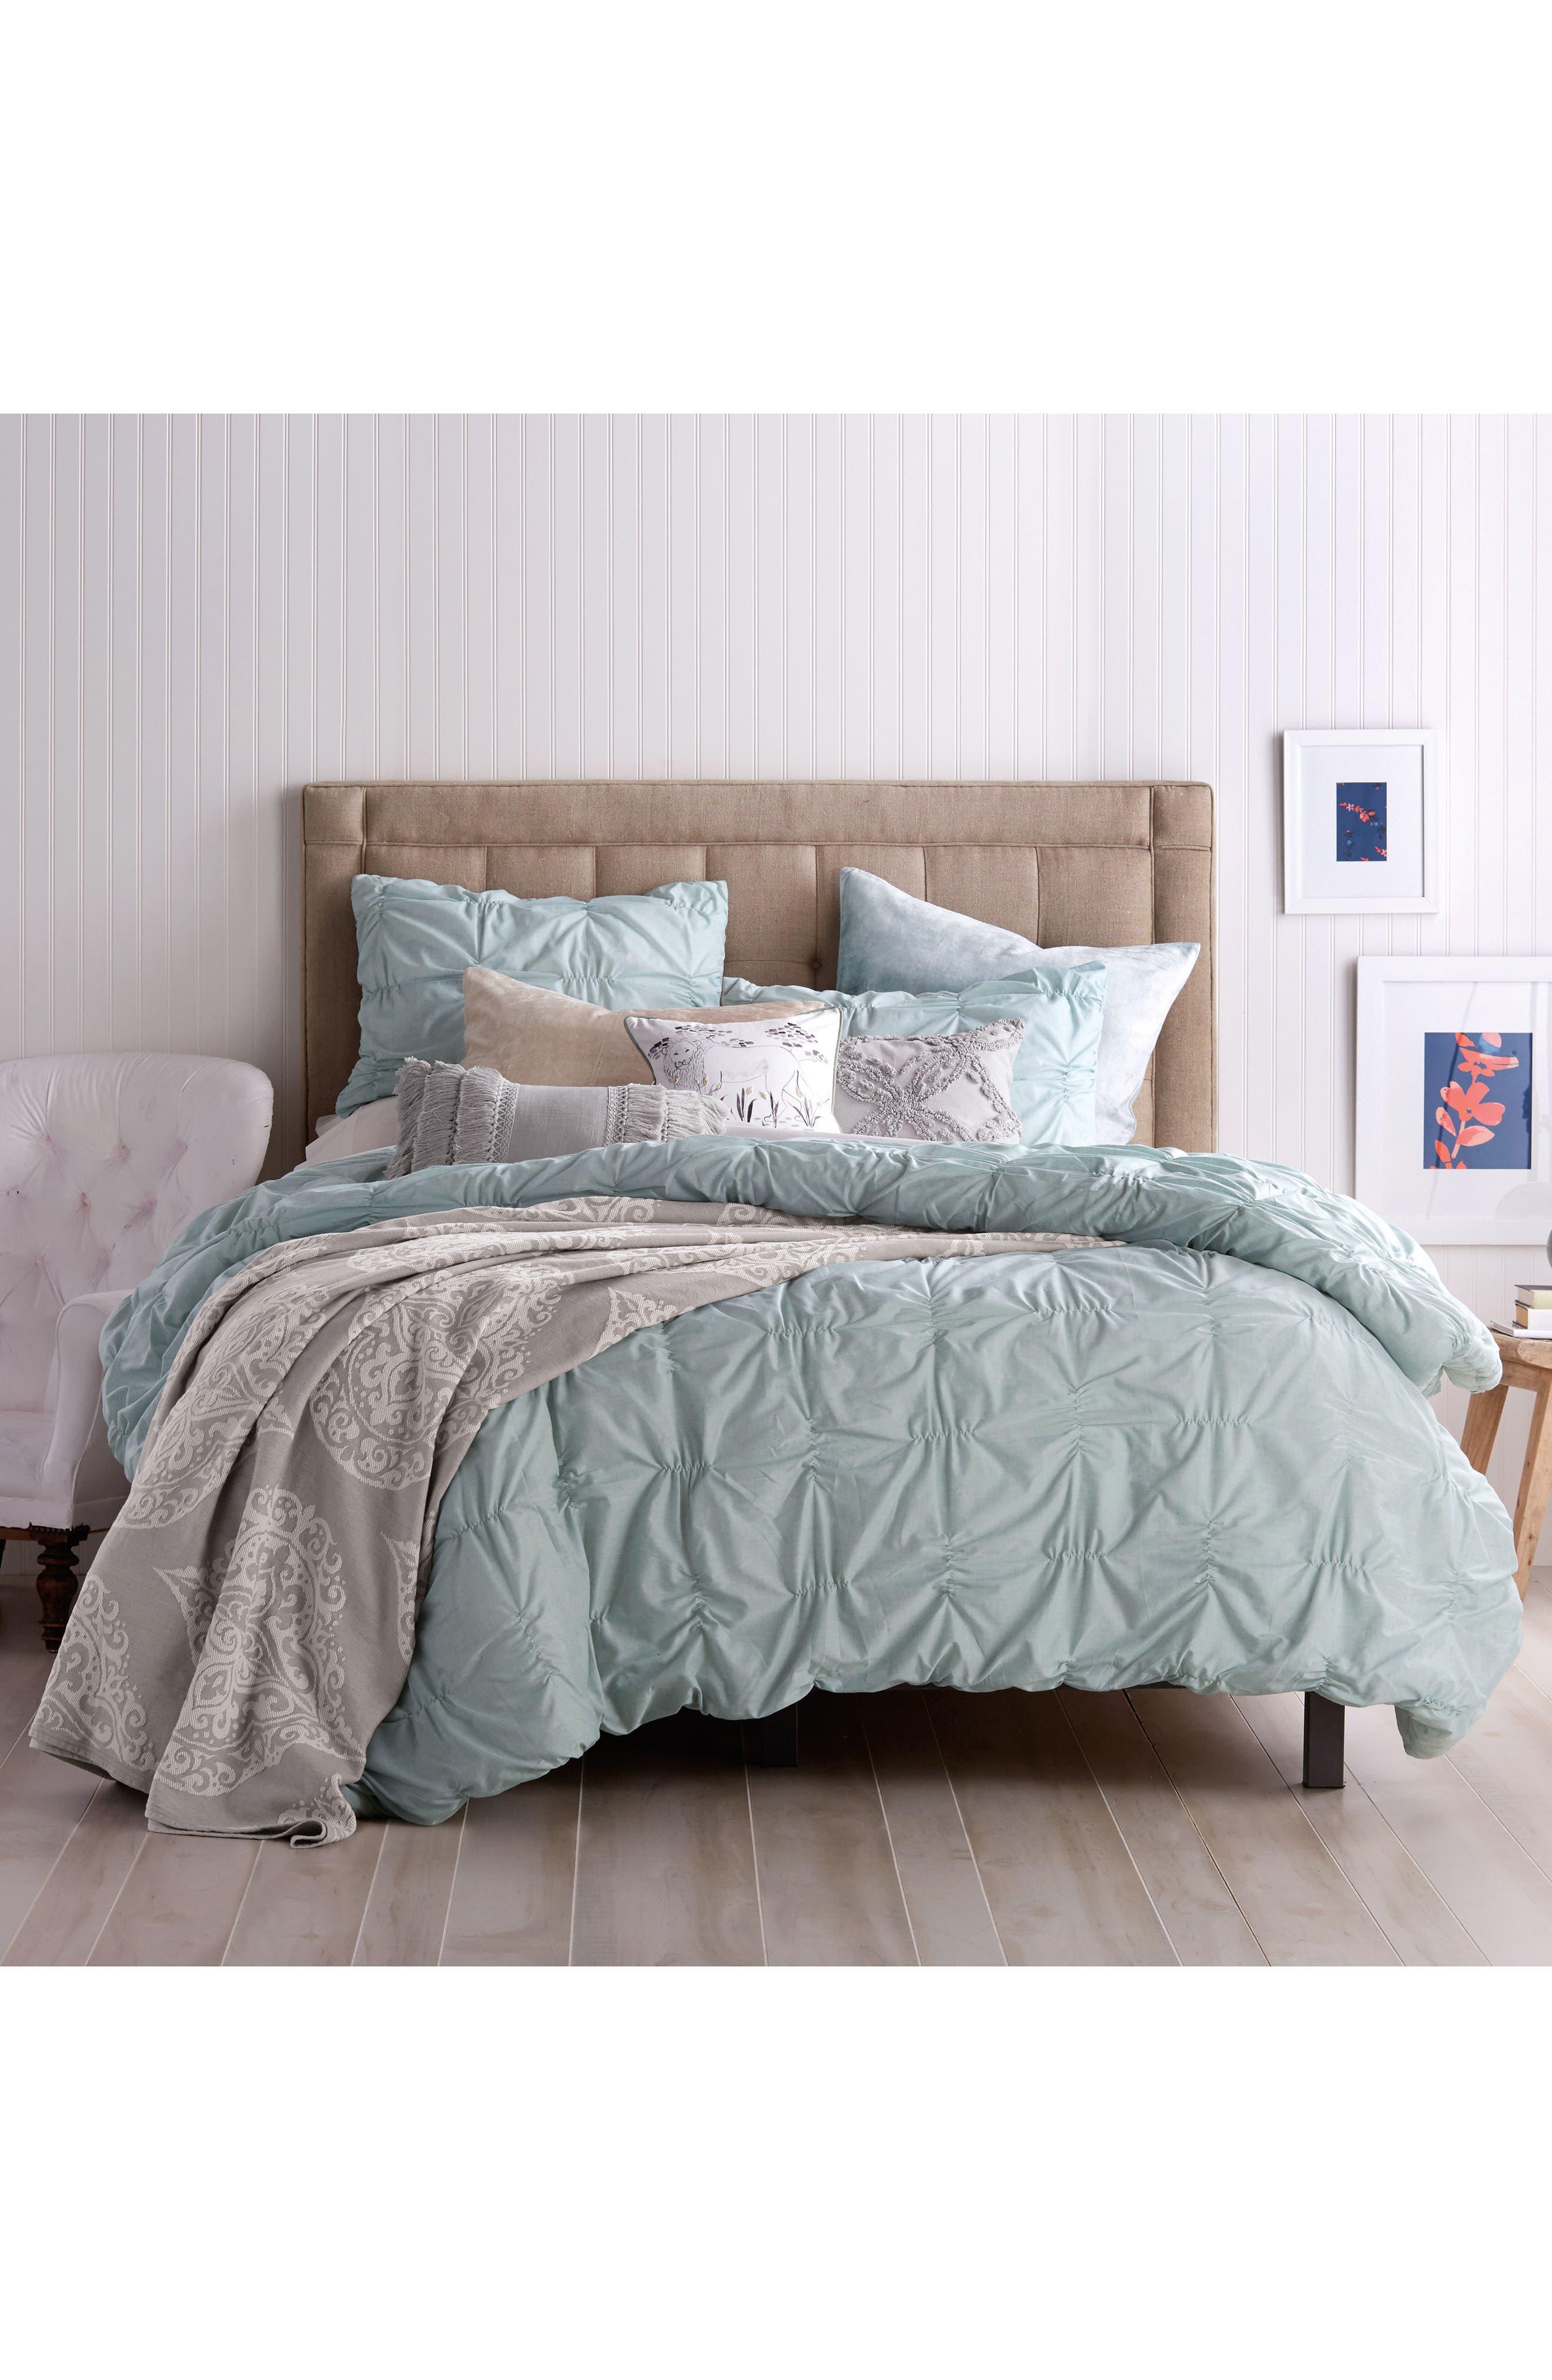 Peri Home Check Smocked Comforter & Sham Set